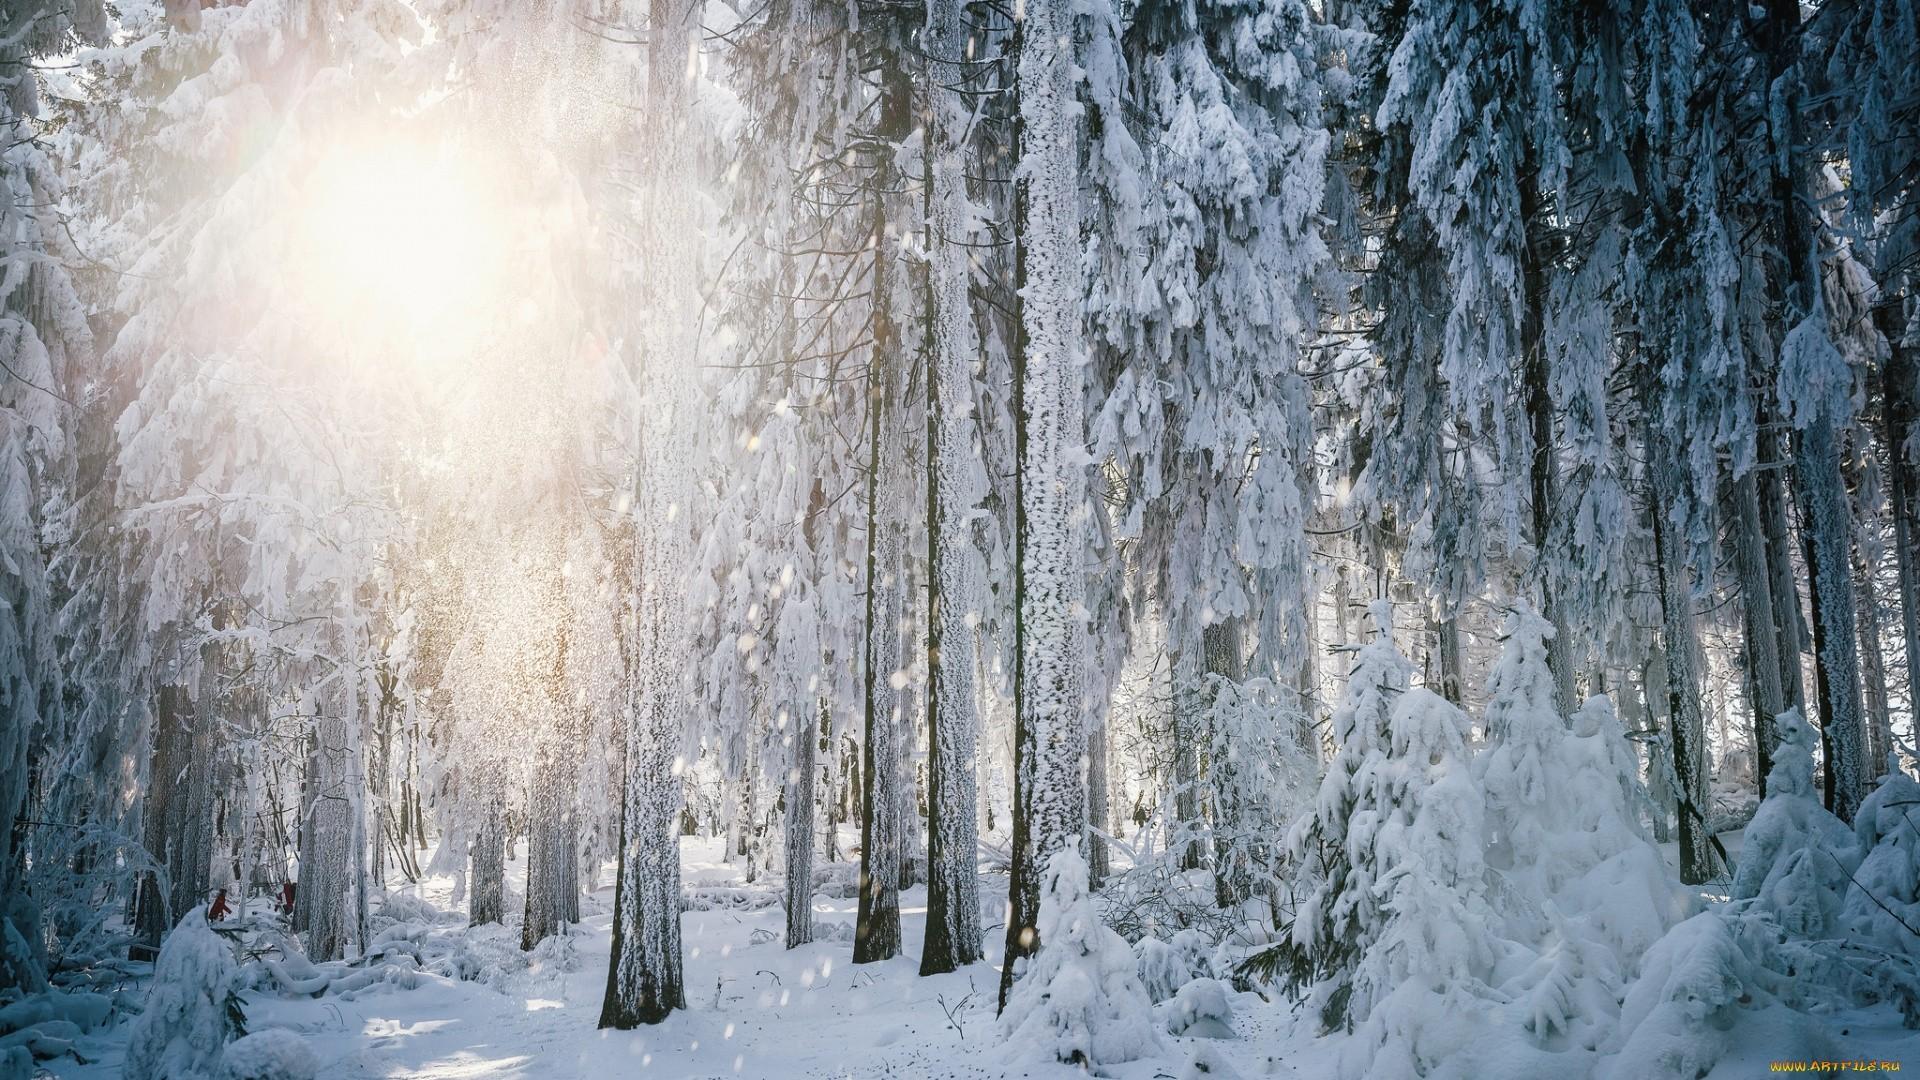 Winter Wonderland HD Wallpaper